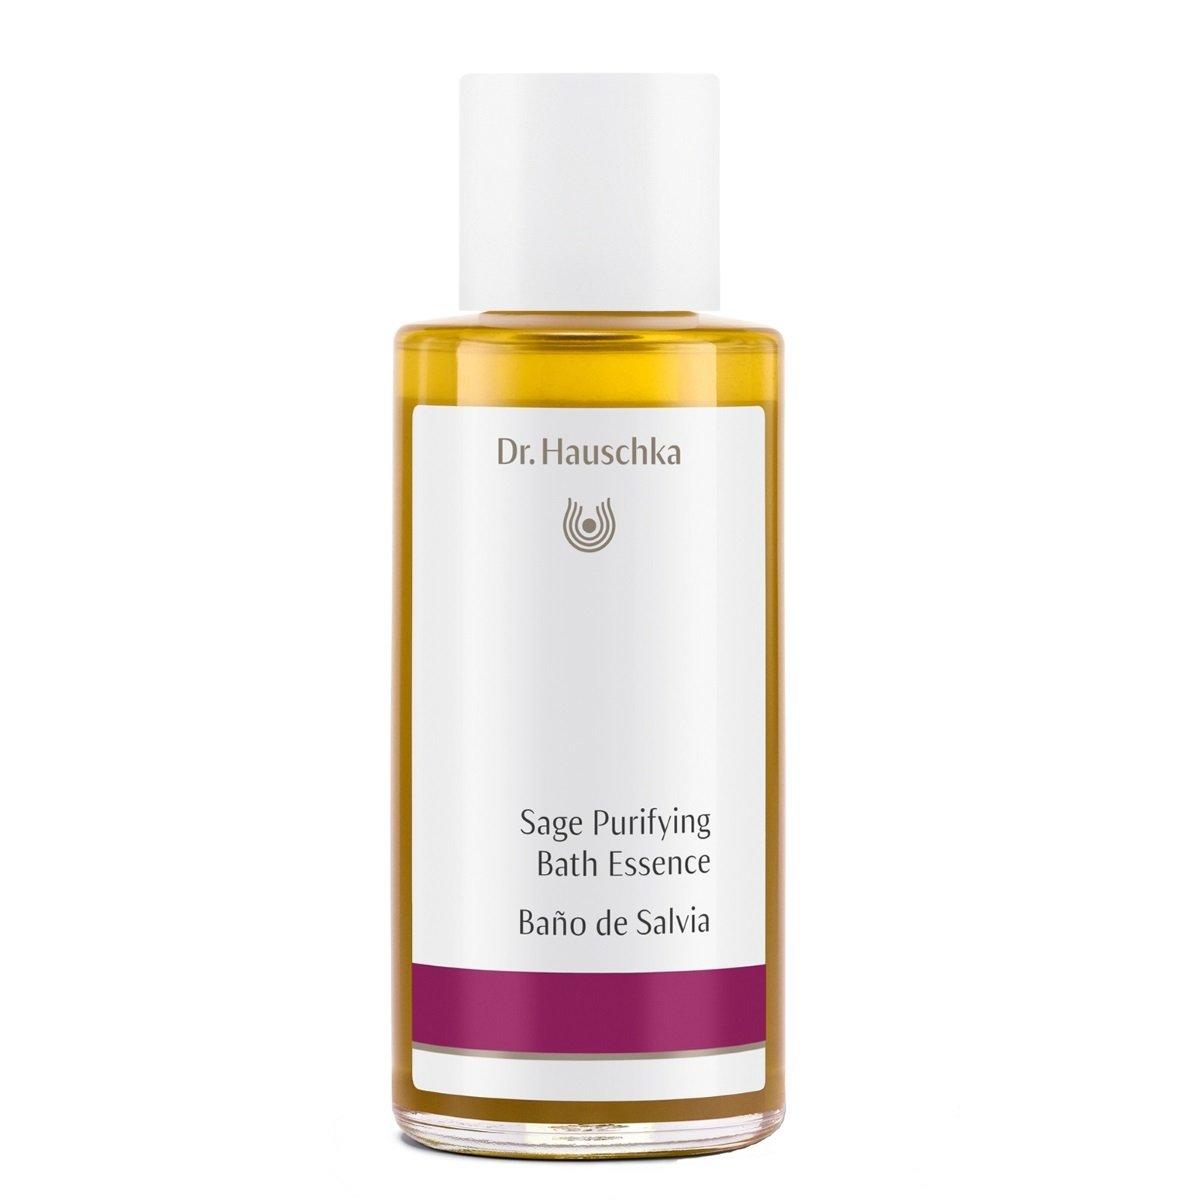 Dr. Hauschka Purifying Bath Essence, Sage, 3.4 Fluid Ounce Dr. Hauschka Skin Care SGB